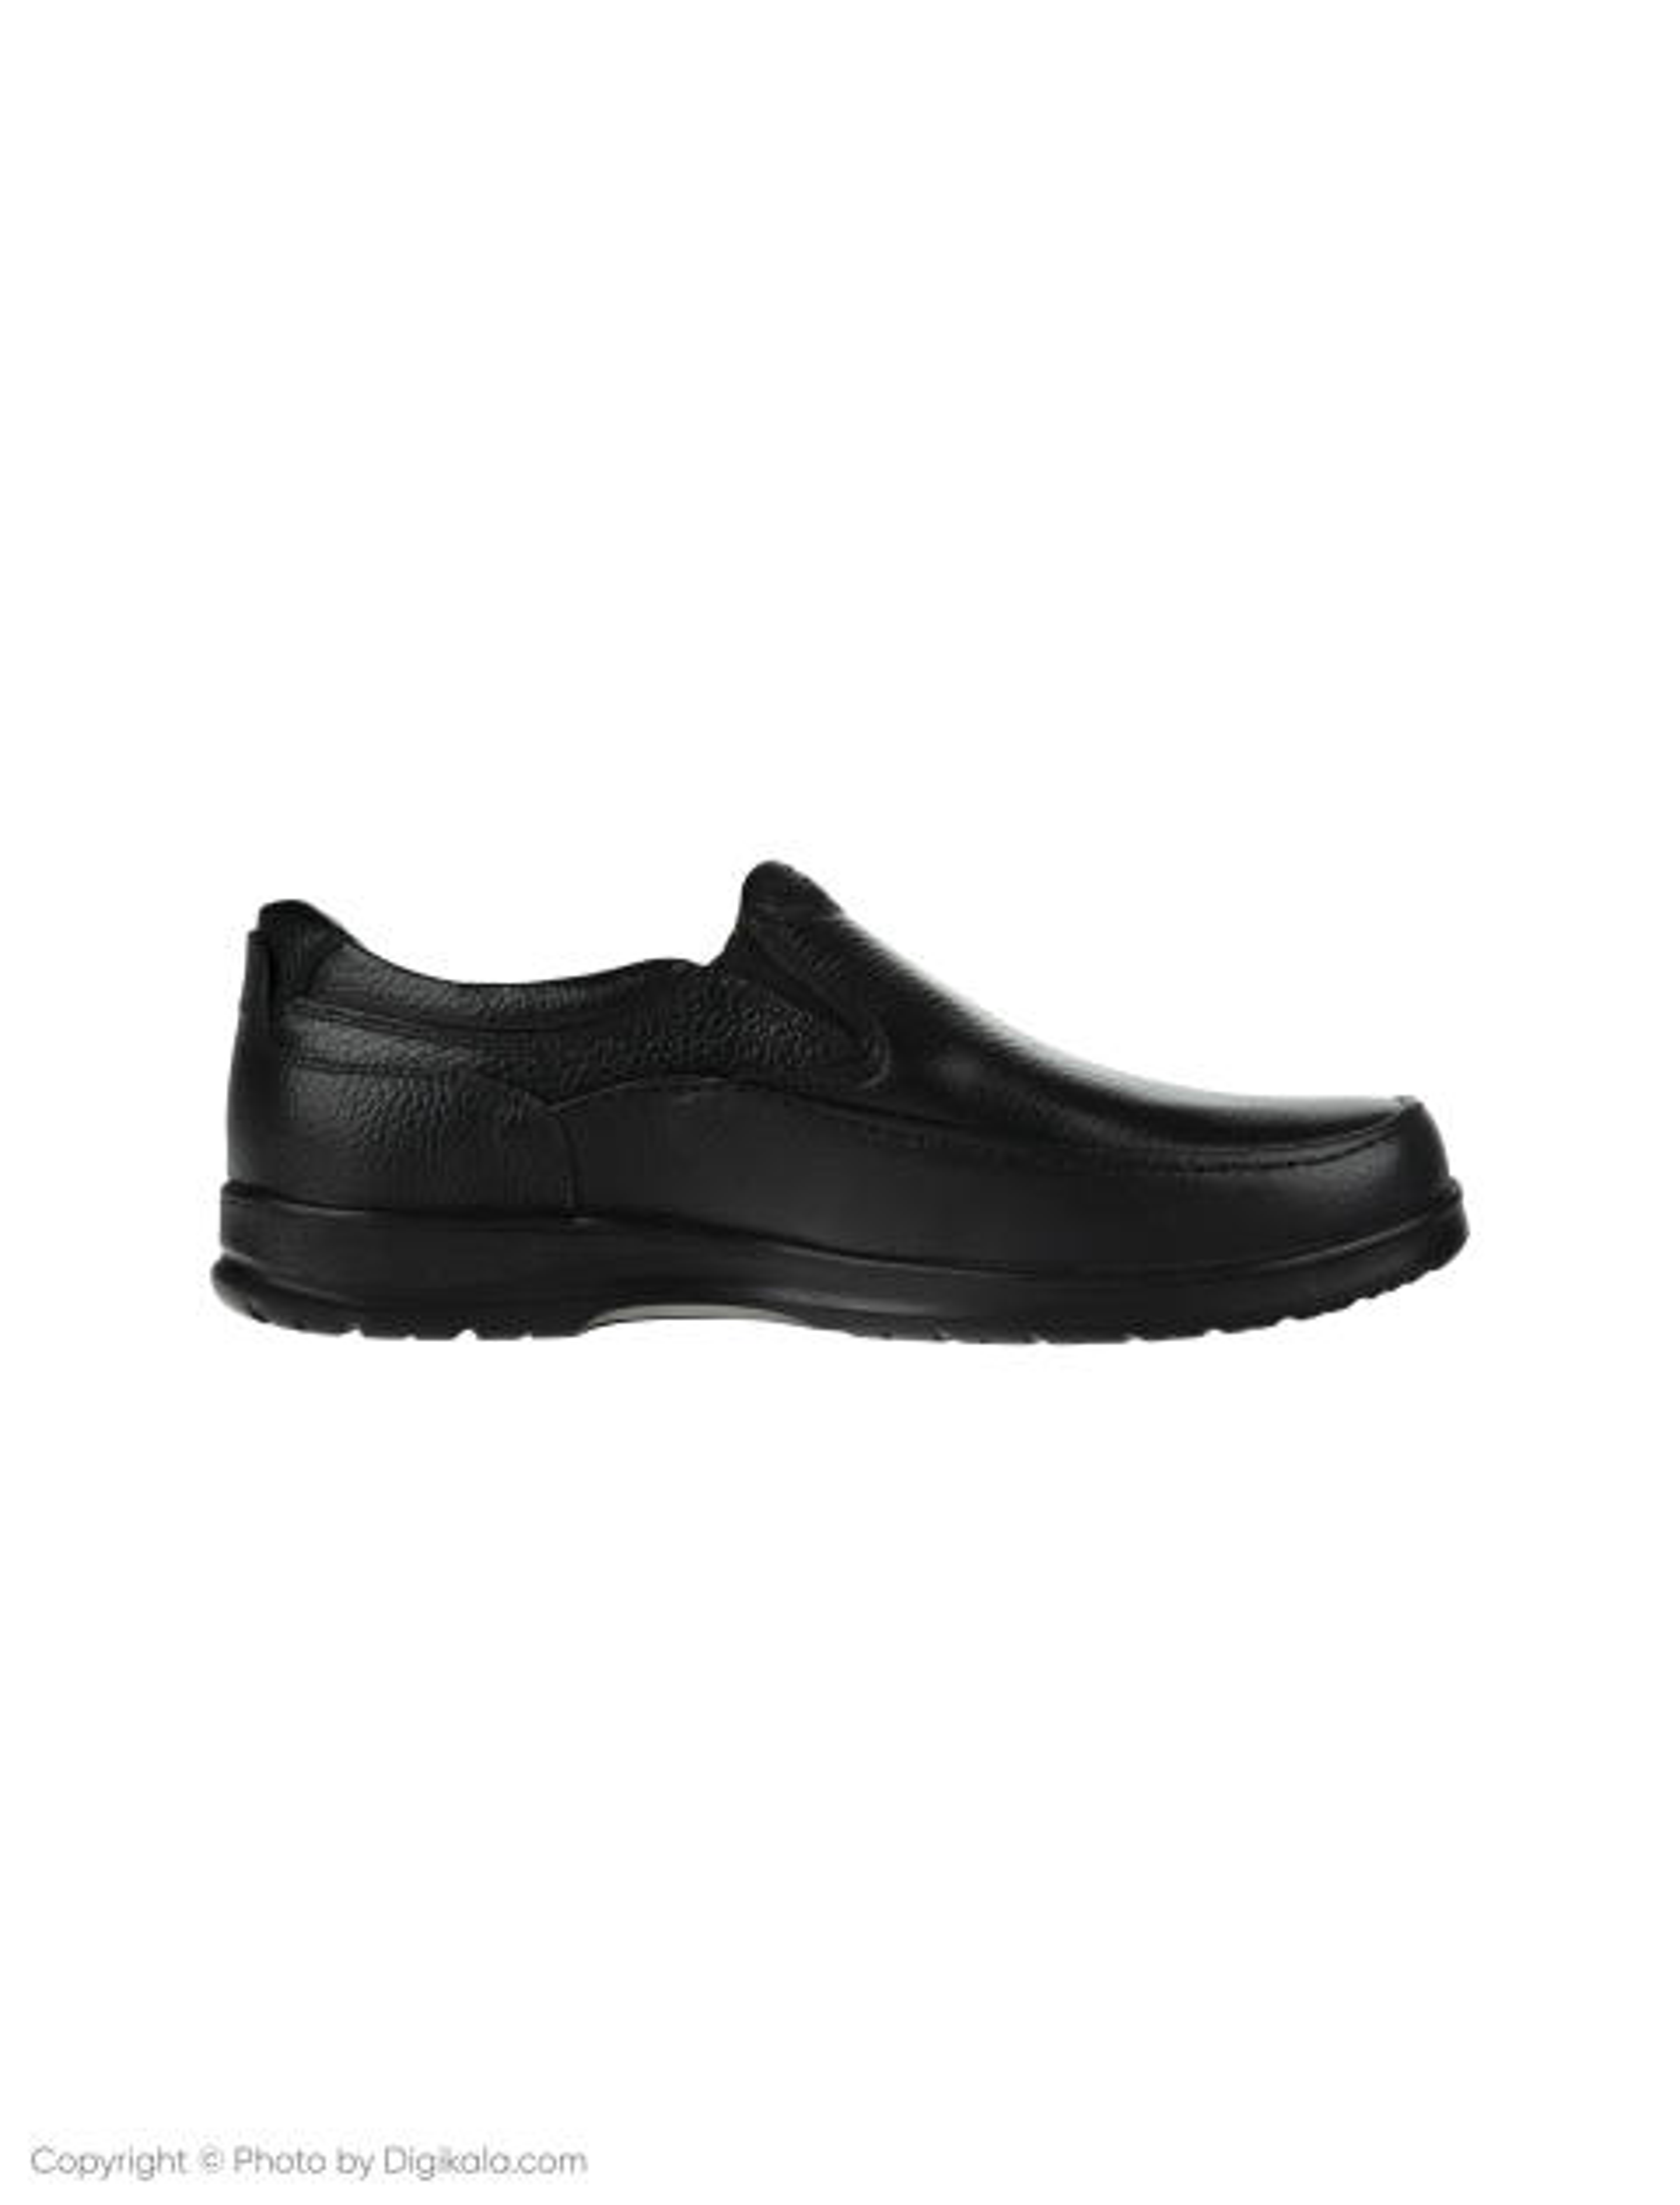 کفش روزمره مردانه ساتین مدل SN7172A-101 -  - 2